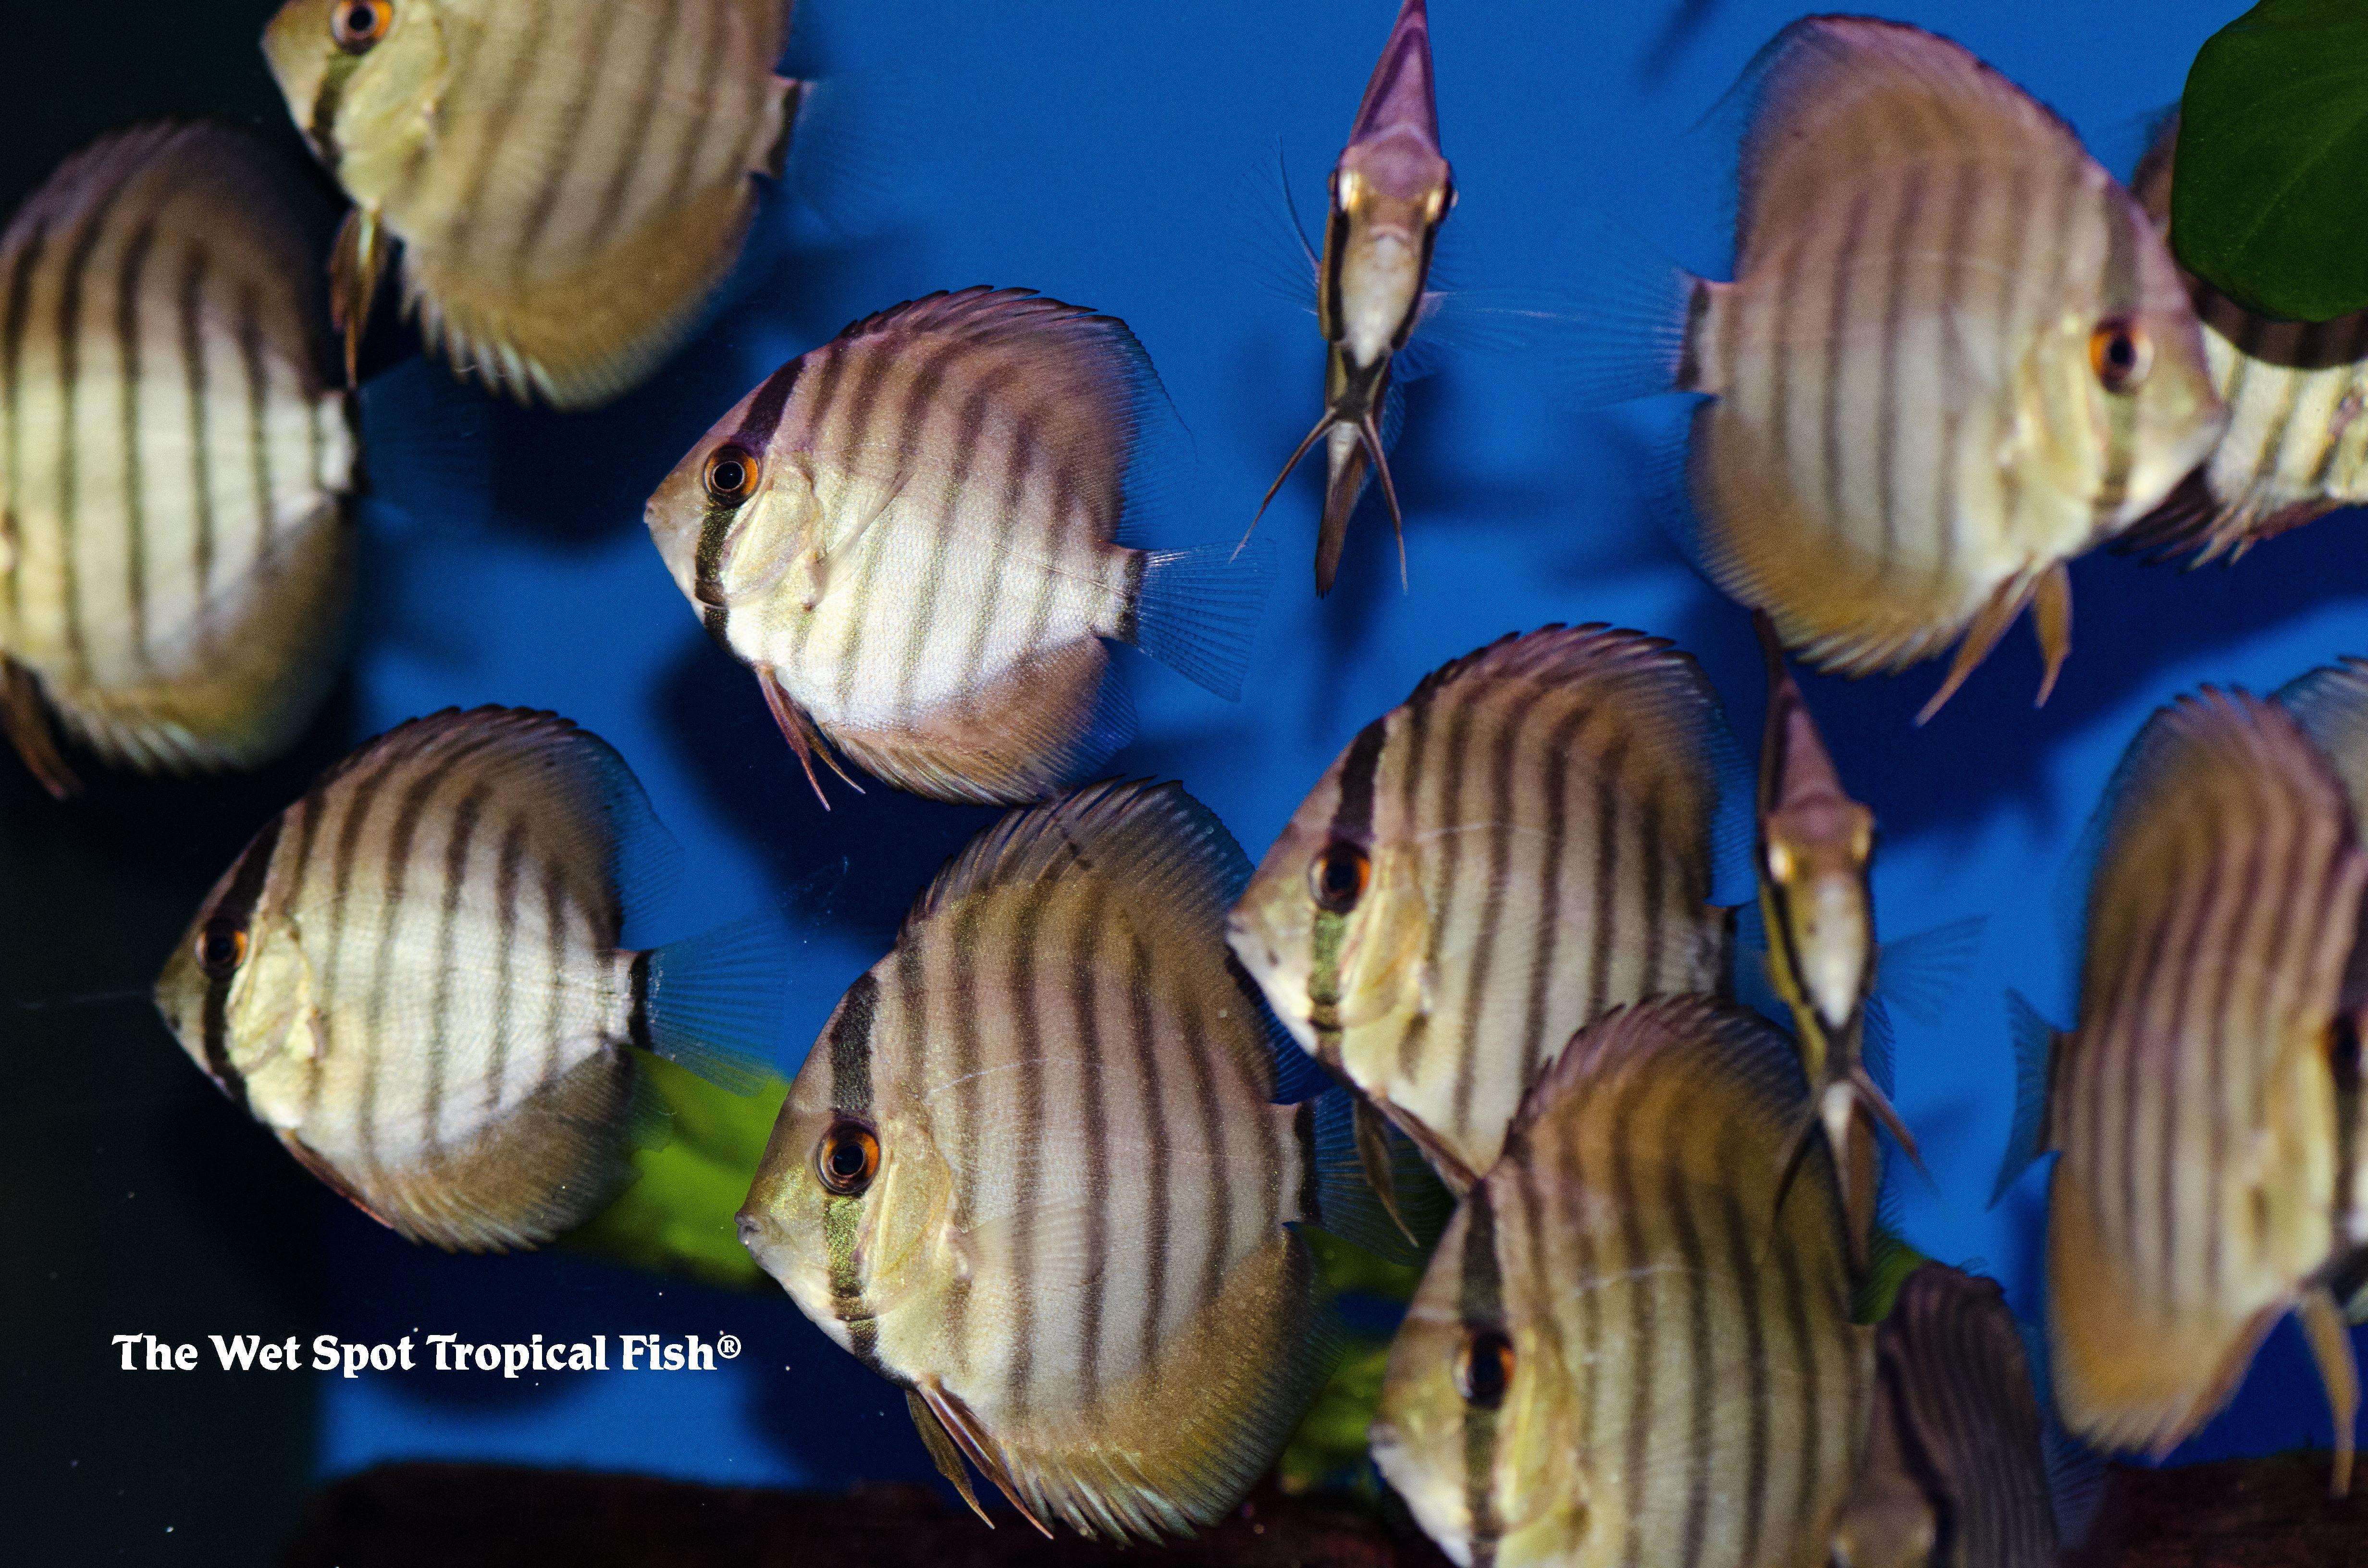 Discus Symphysodon Tropicalfish Exoticfish Freshwaterfish Cichlid Fishforsale Aquariumaddict Aquariumde Tropical Fish South American Cichlids Cichlids